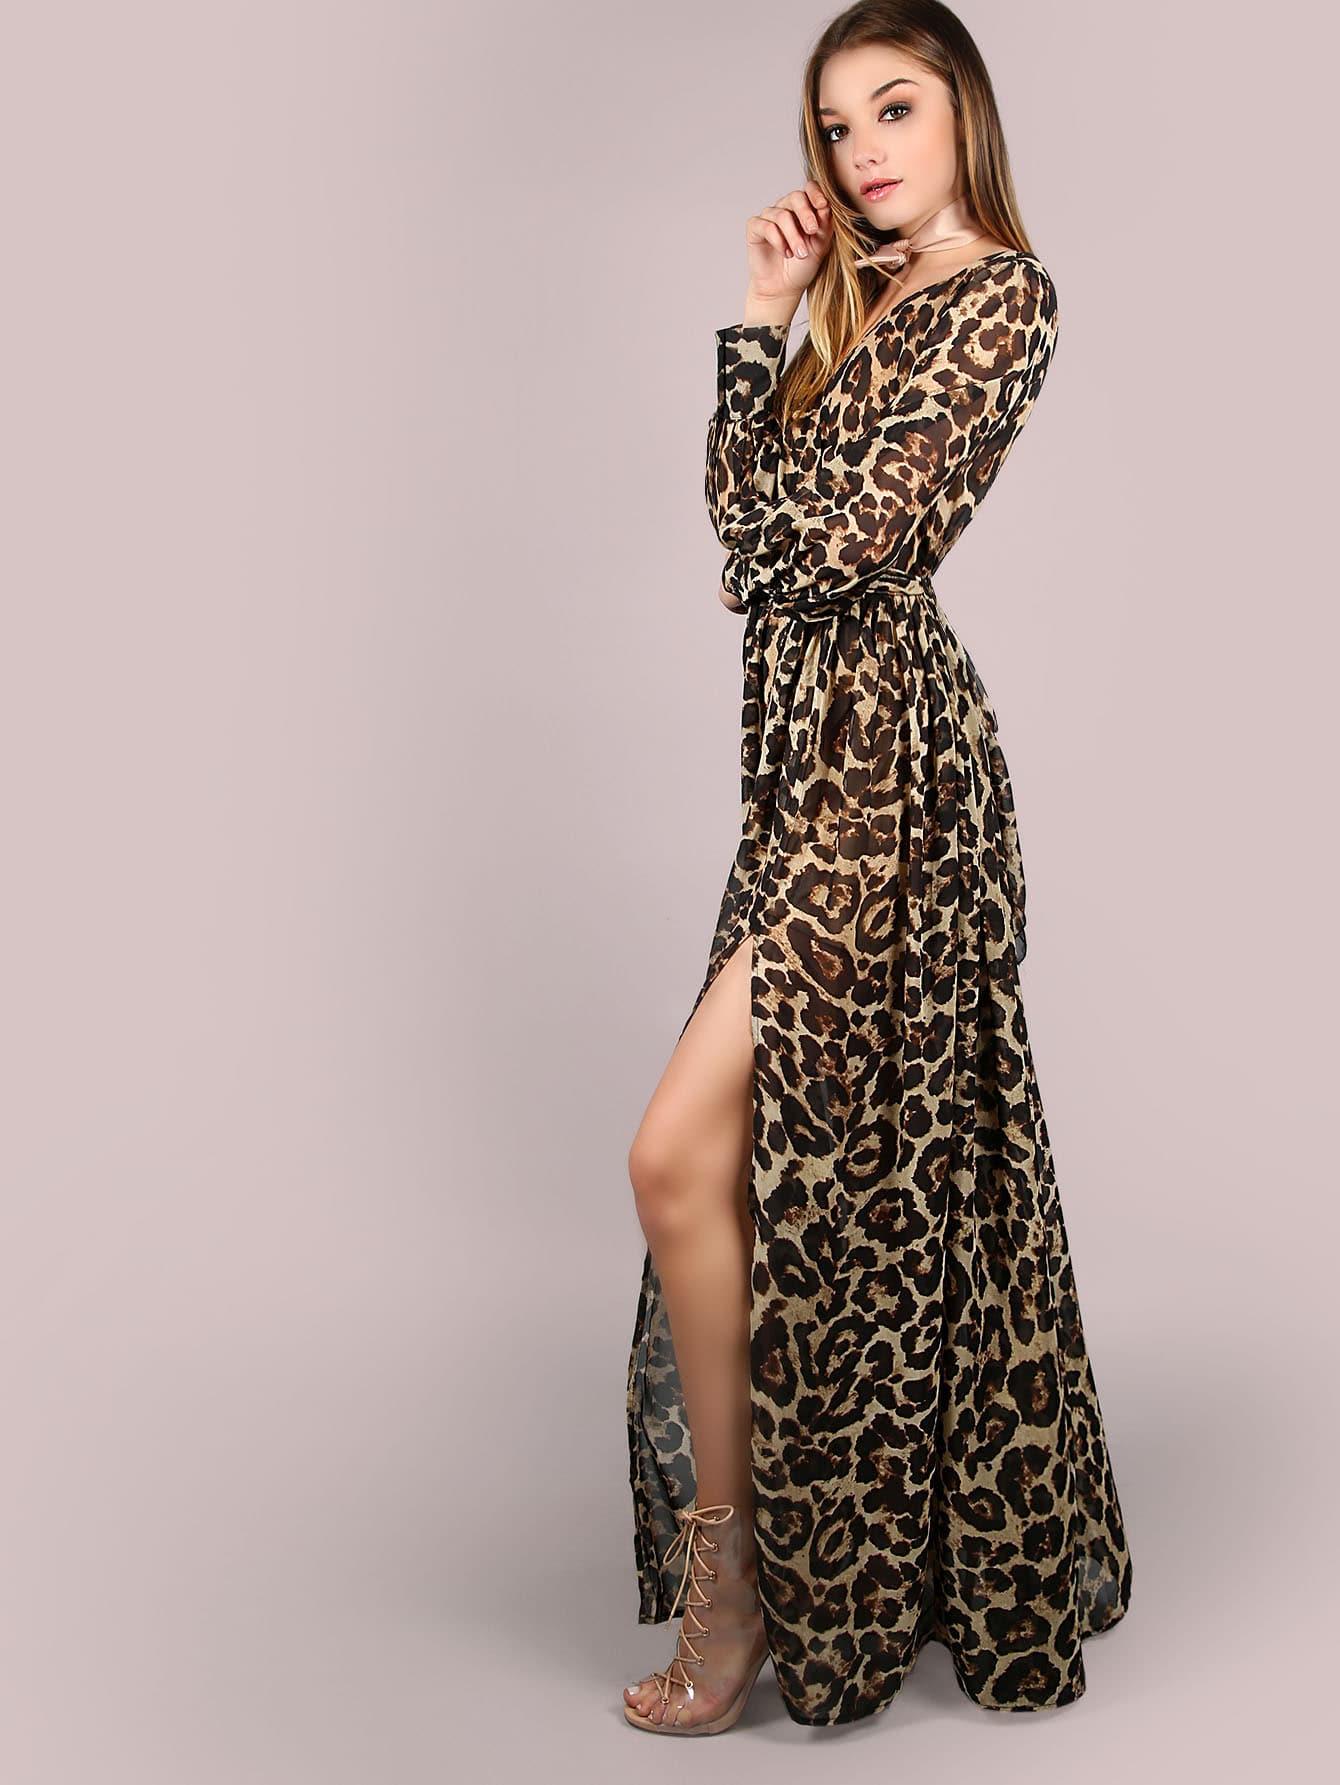 Leopard Print Surplice Neckline Chiffon Dress Shein